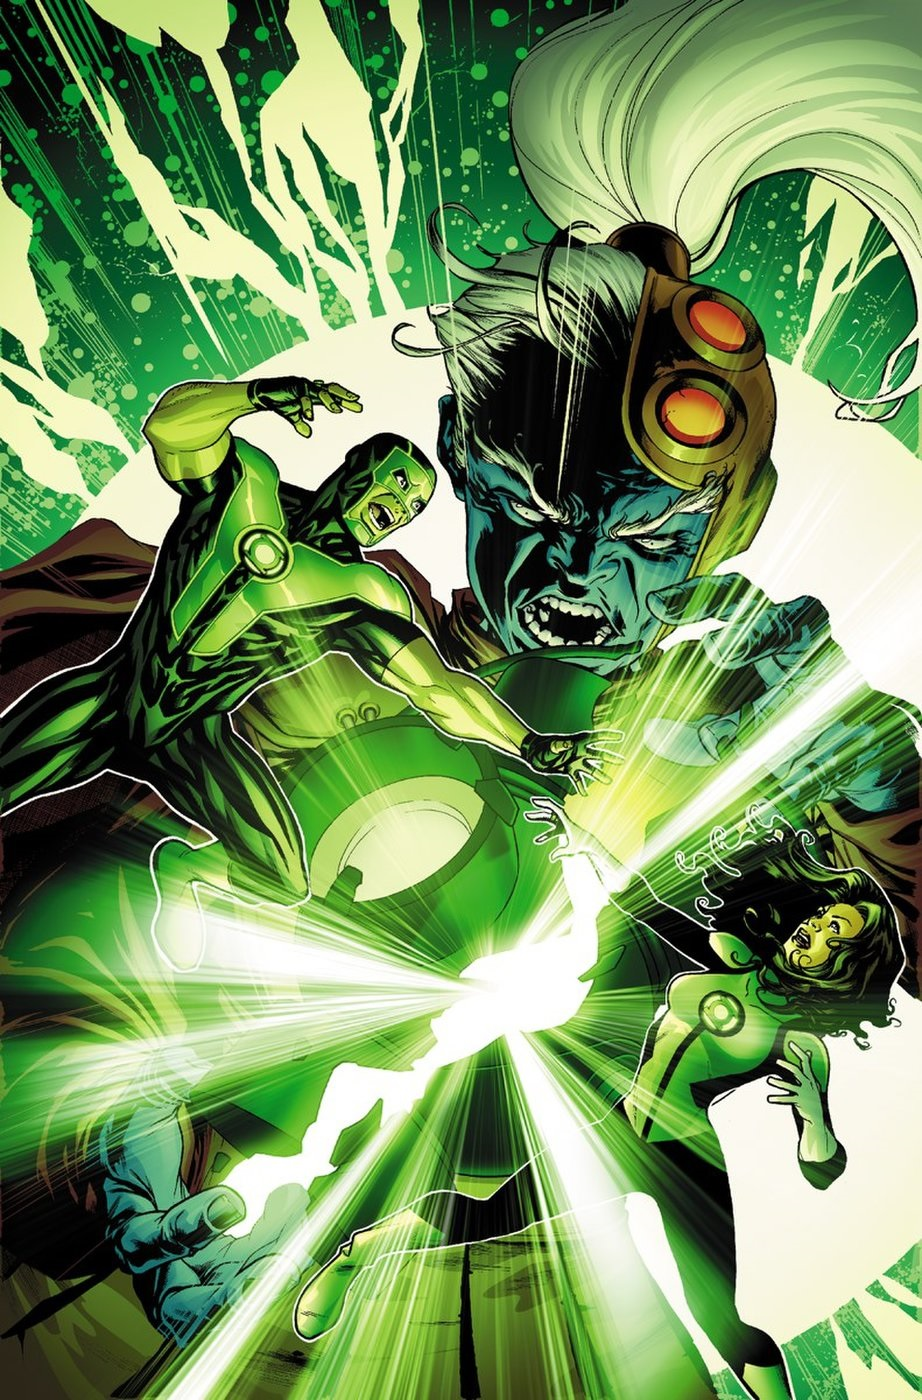 Green Lanterns Vol 1 26 Textless.jpg